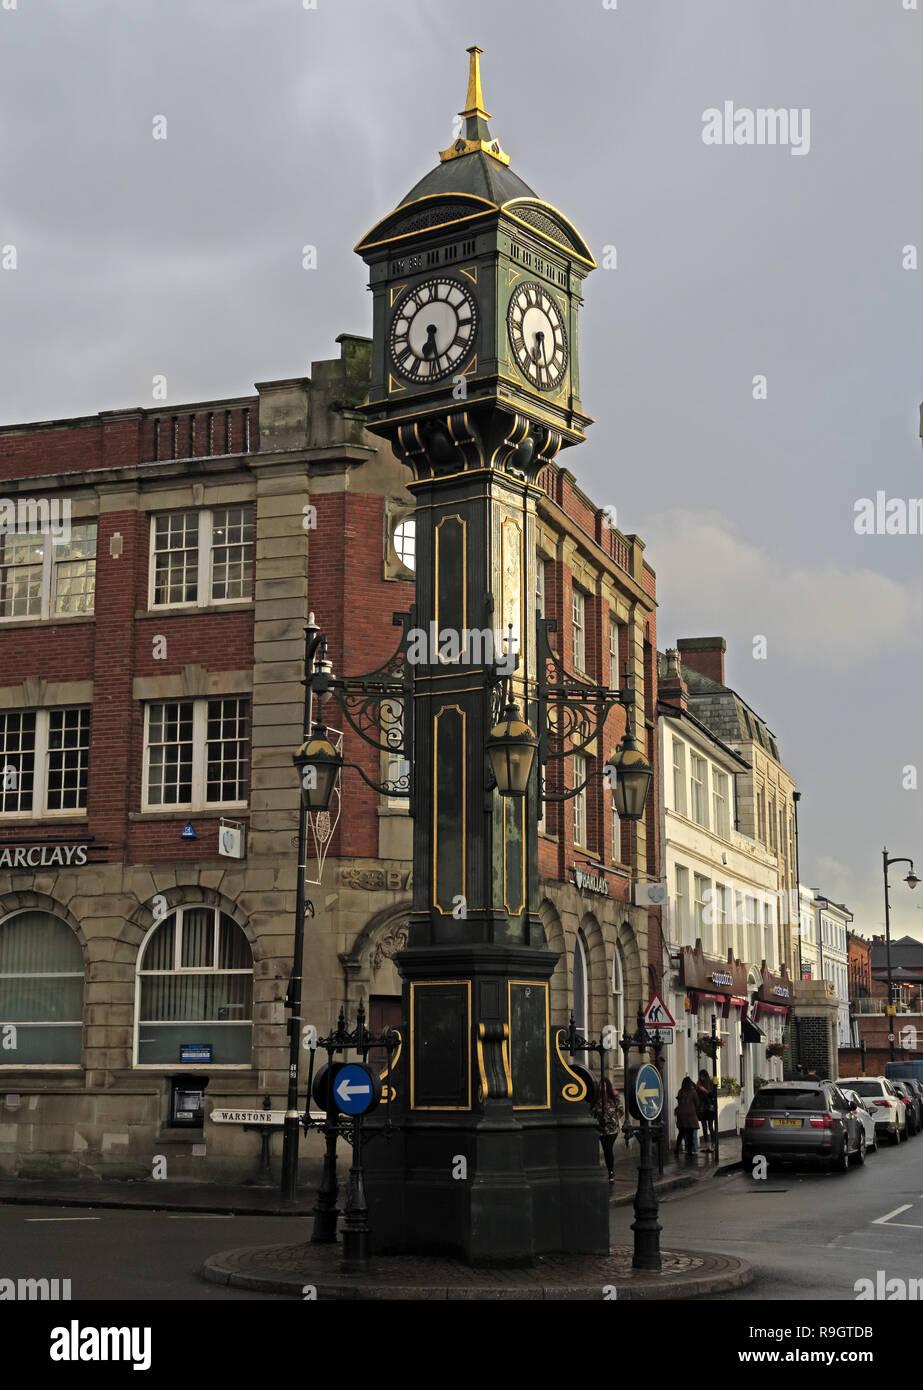 Dieses Stockfoto: Chamberlain, Edwardian, Guss, Clock Tower, Jewellery Quarter, Birmingham, West Midlands, England, Großbritannien, - R9GTDB